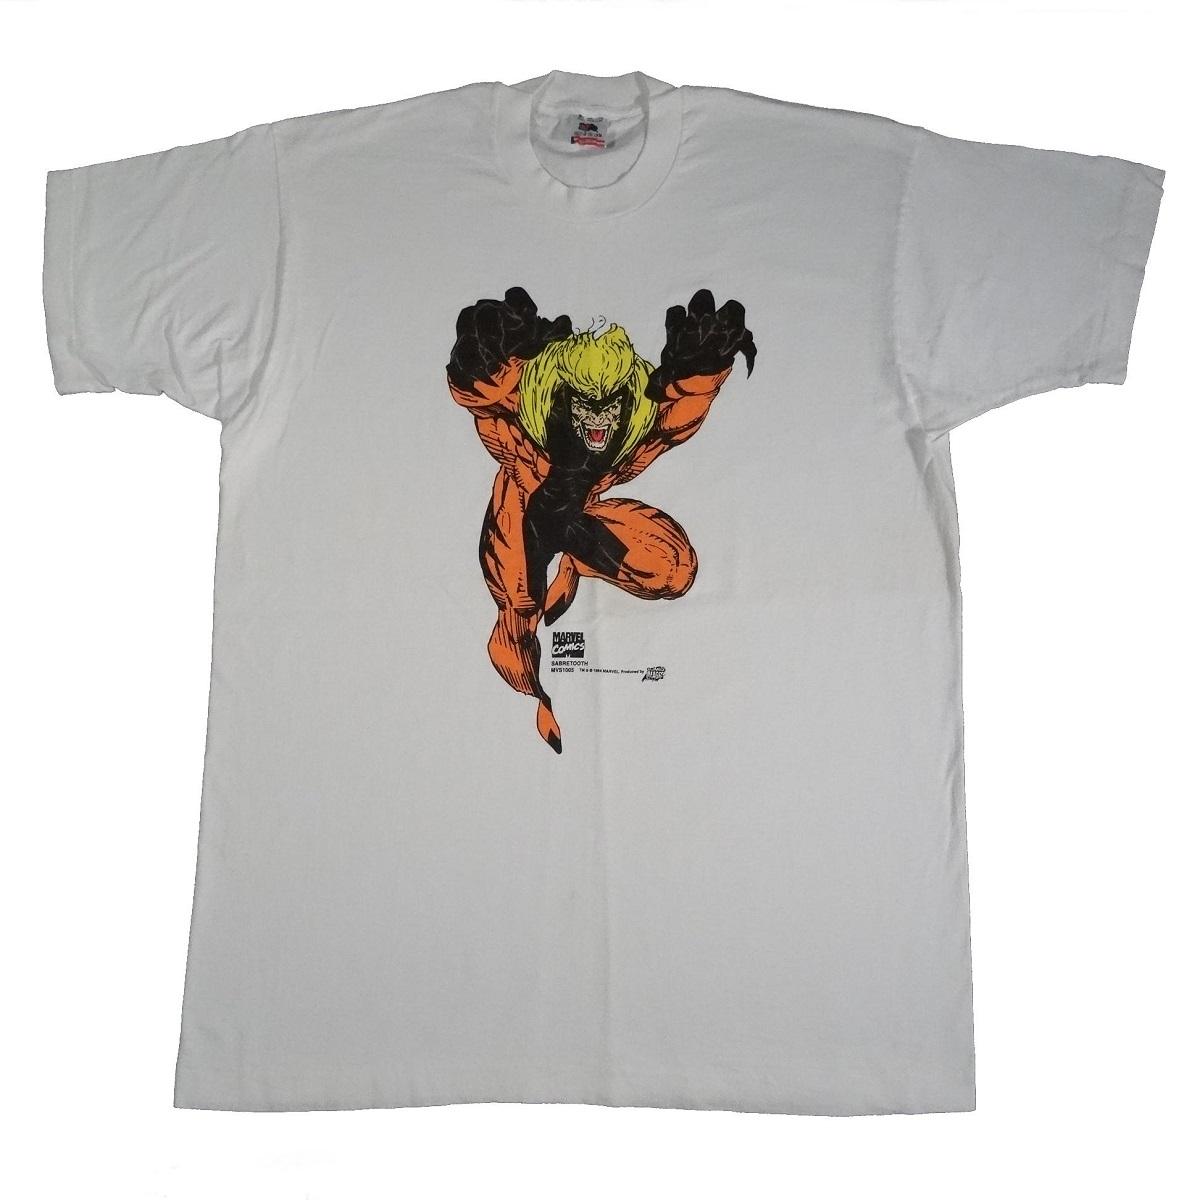 Marvel Comics Sabretooth Vintage 1994 Shirt Tarks Tees Front of Shirt